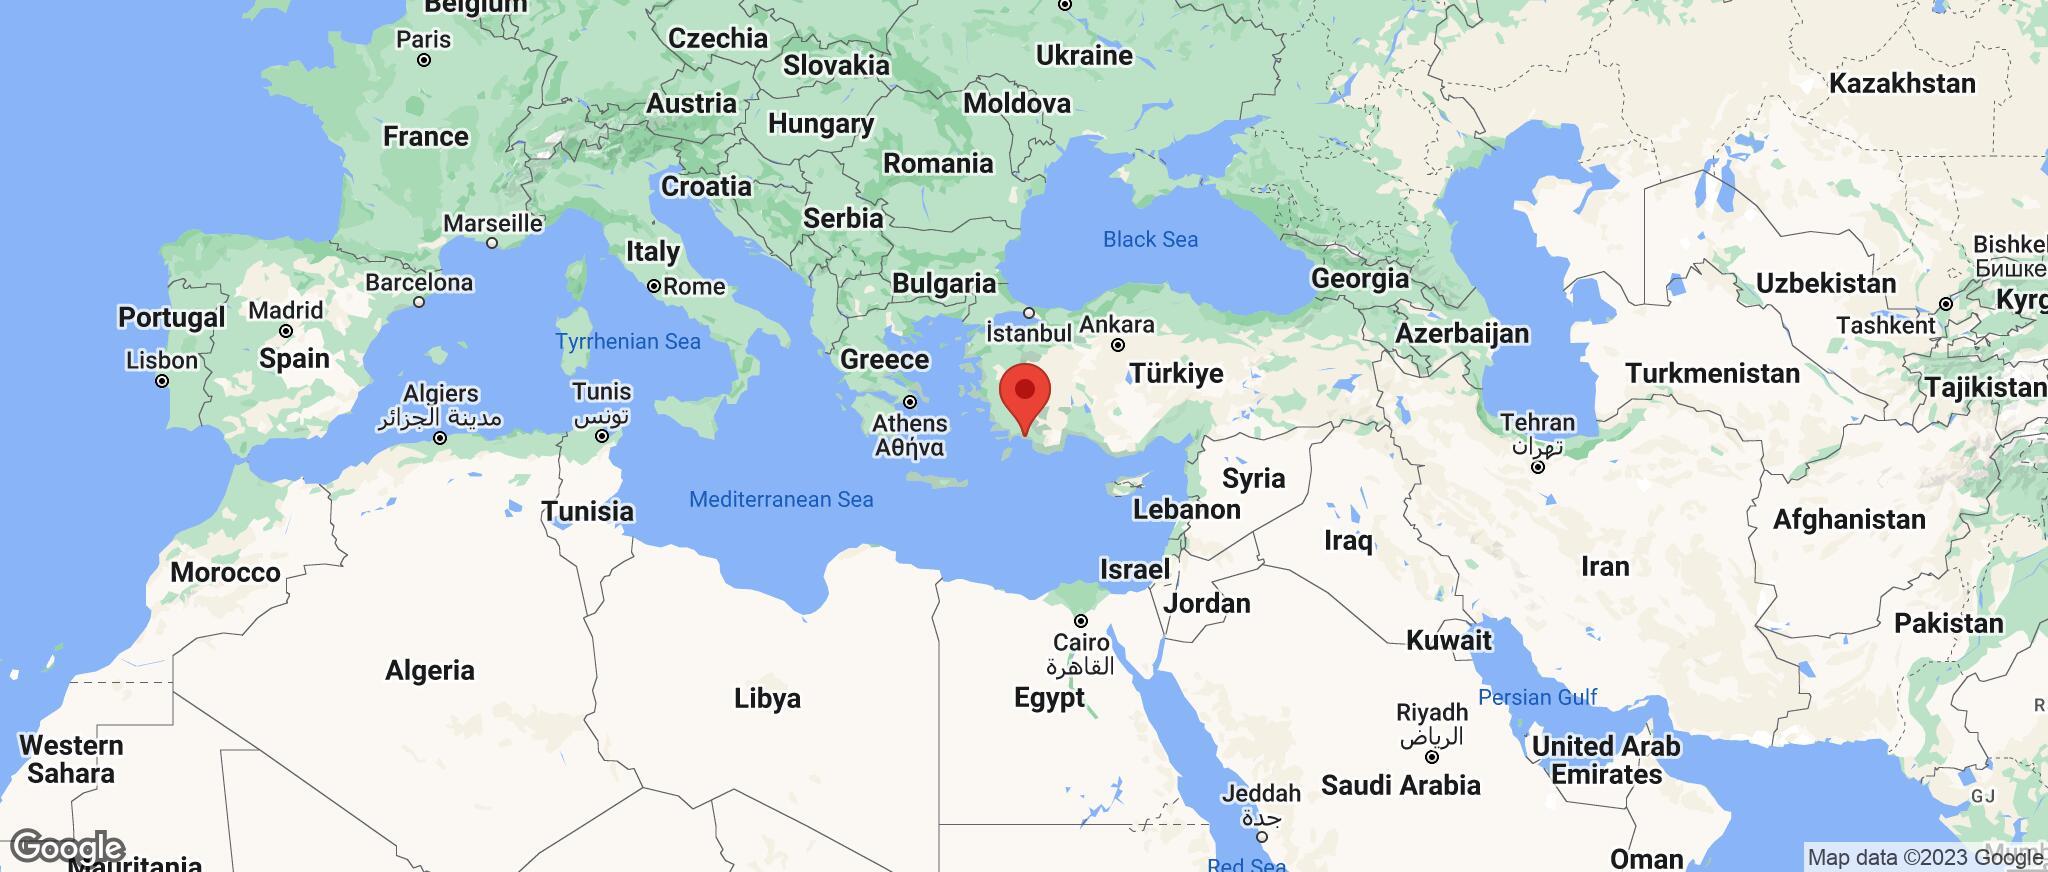 Map showing the location of Dalaman Region